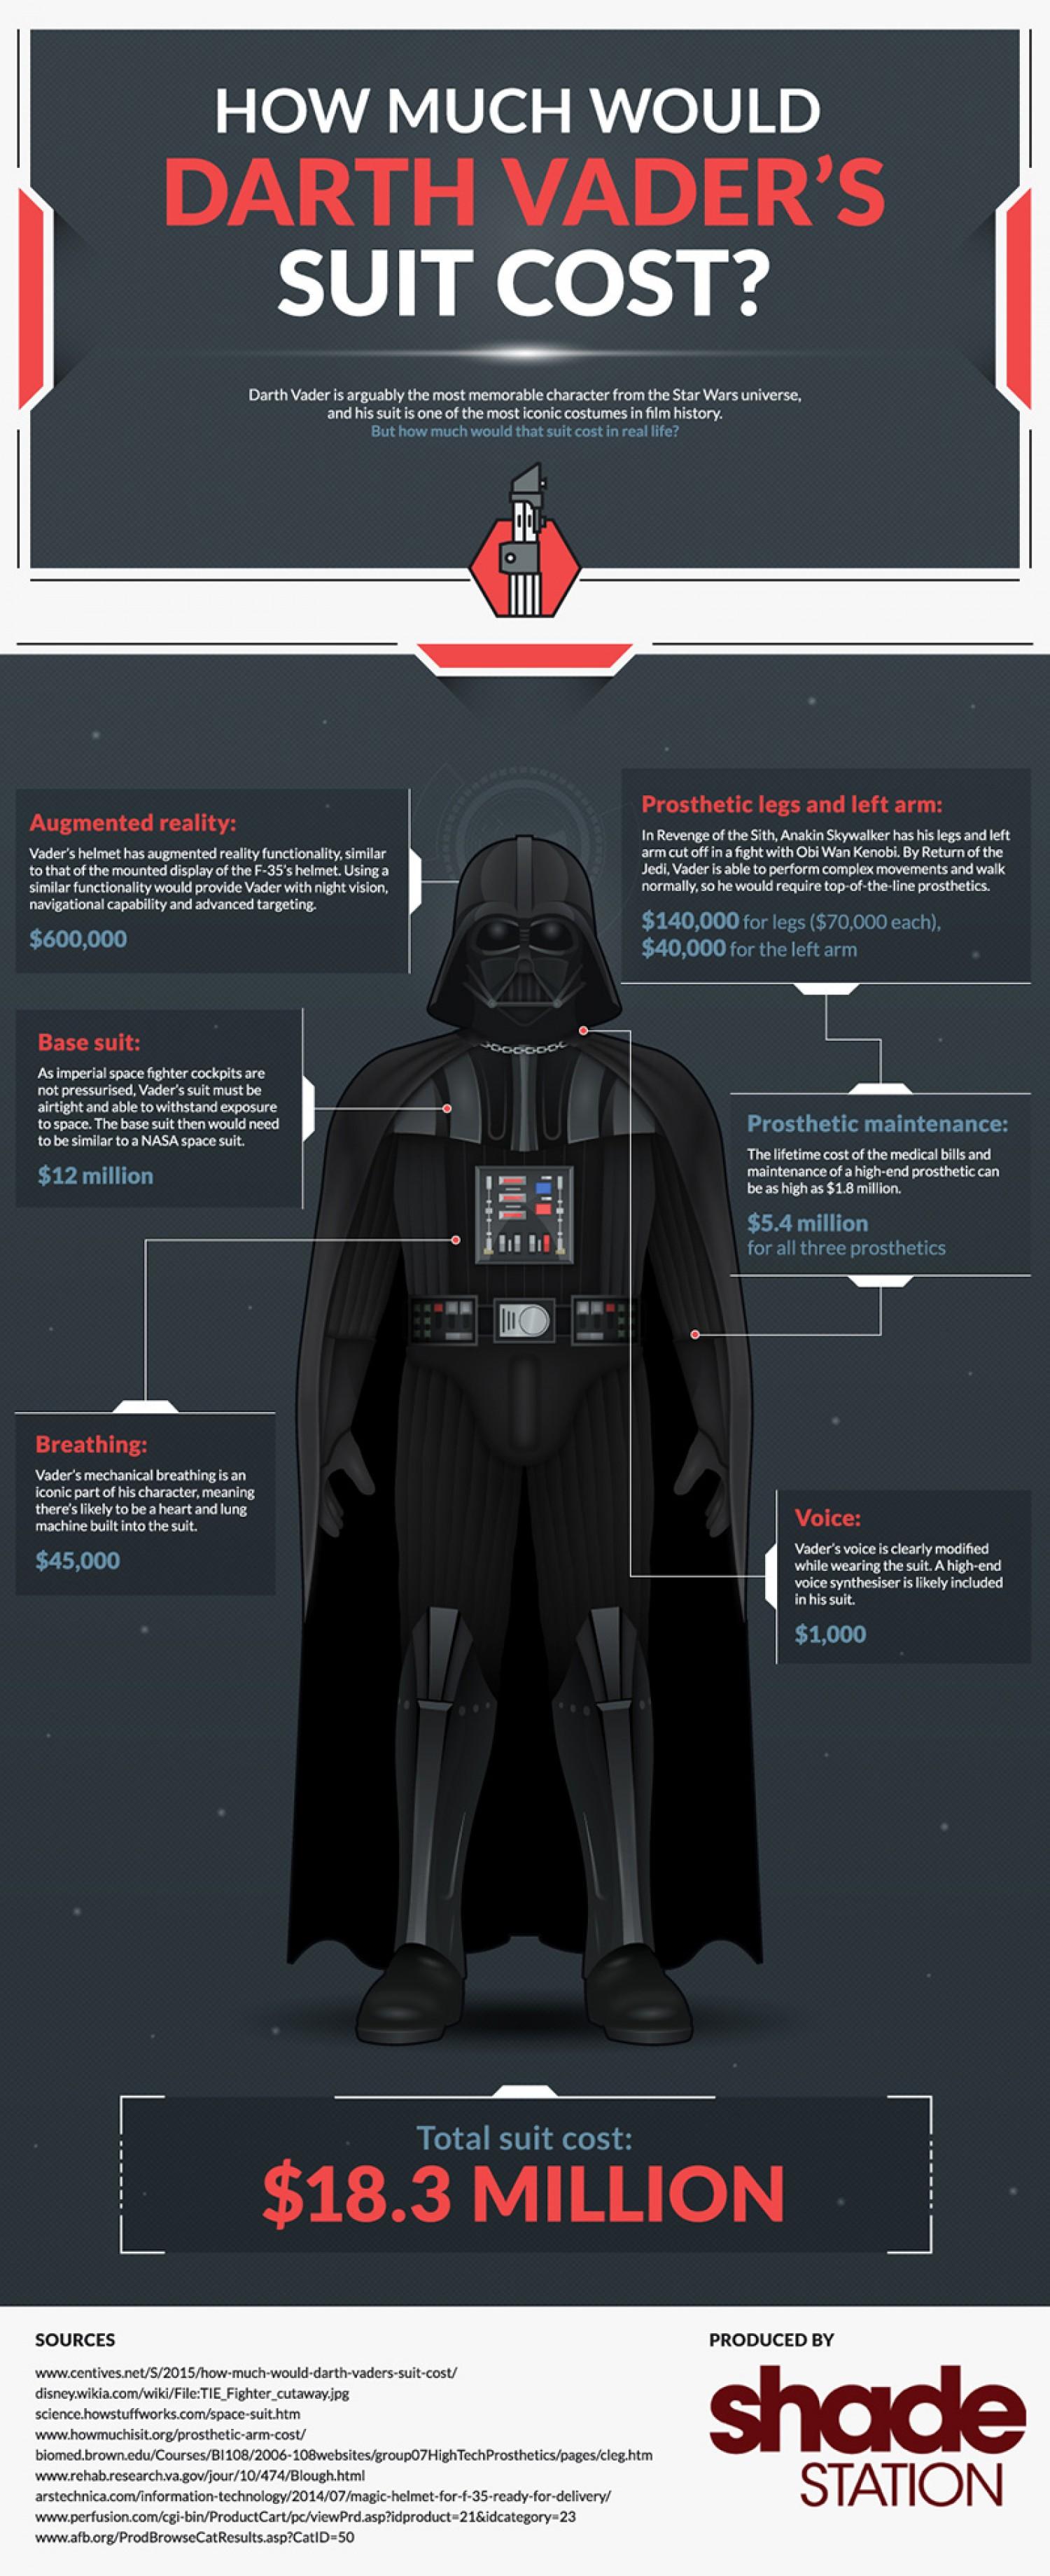 how-much-would-darth-vaders-suit-cost-in-real-life #Infographie : Combien coûterait le costume de Dark Vador dans la vraie vie ?